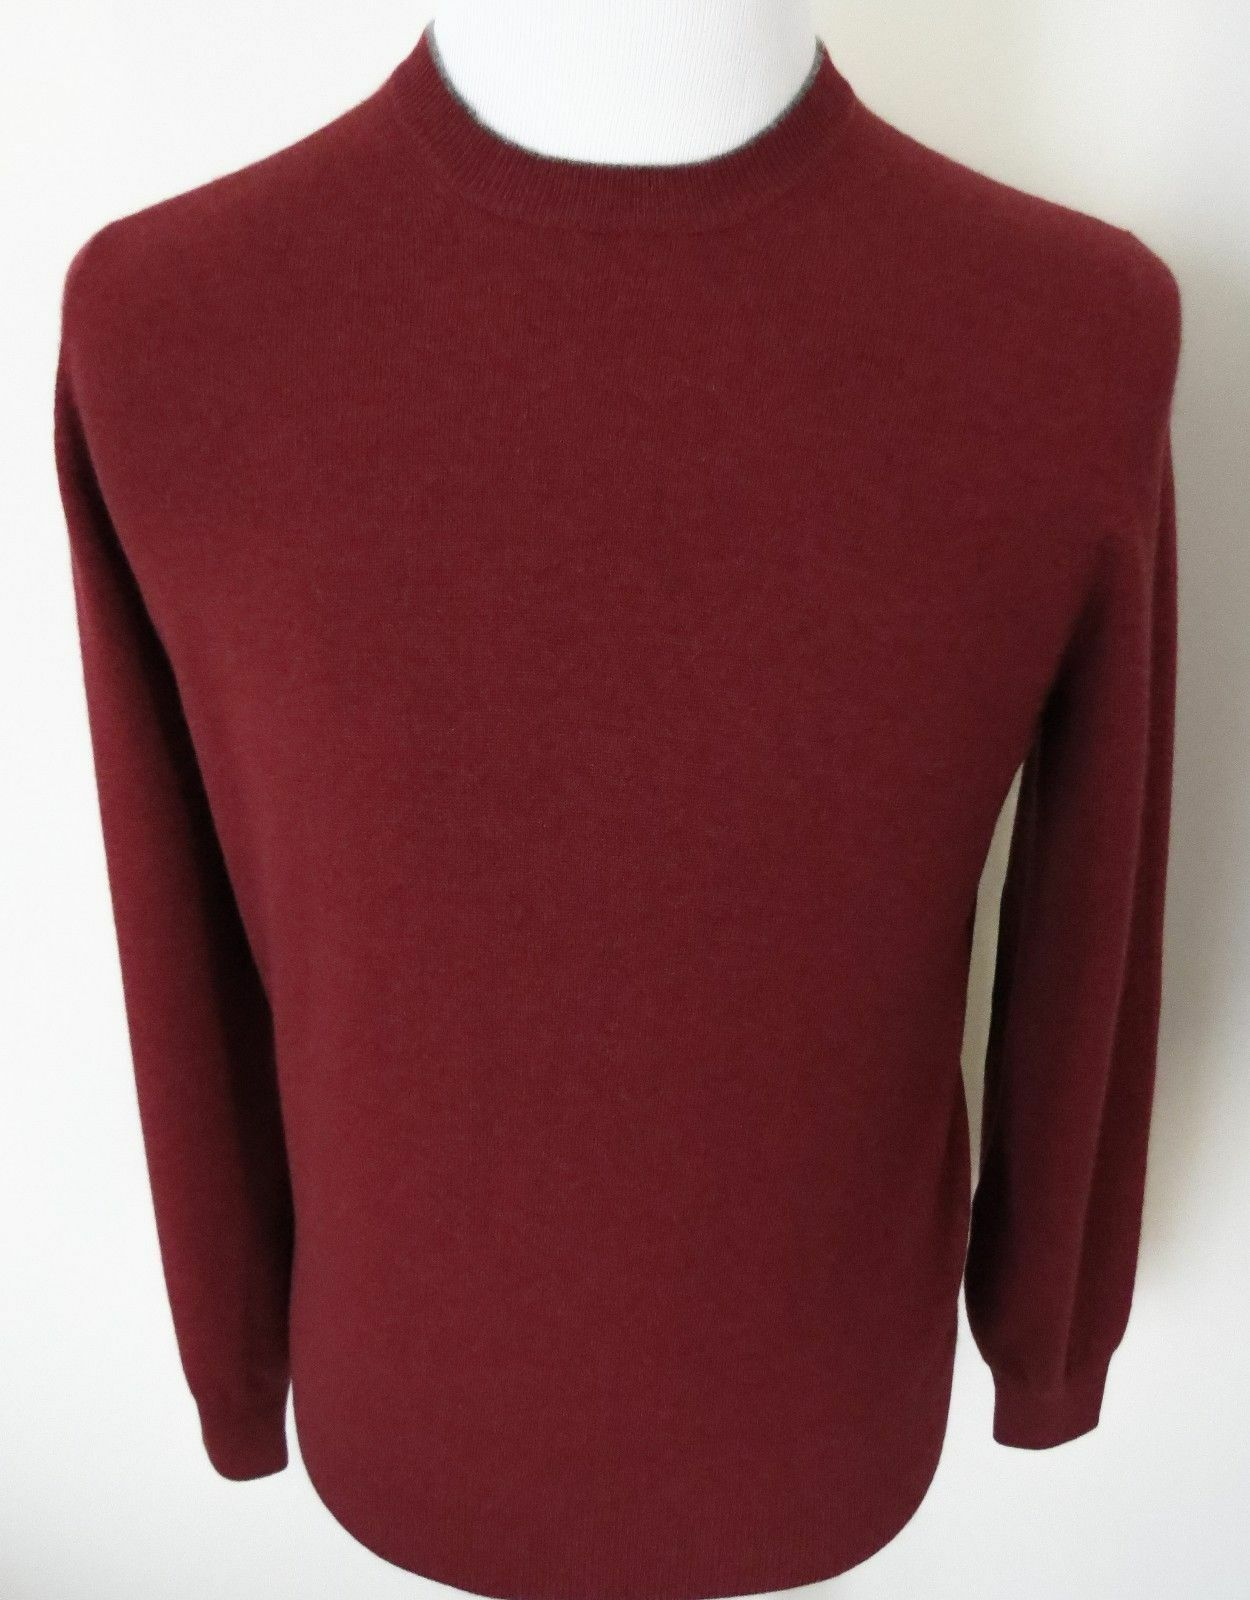 1480 BRUNELLO CUCINELLI Rust 100% Cashmere Sweater with Suede Trim 48 EU Small